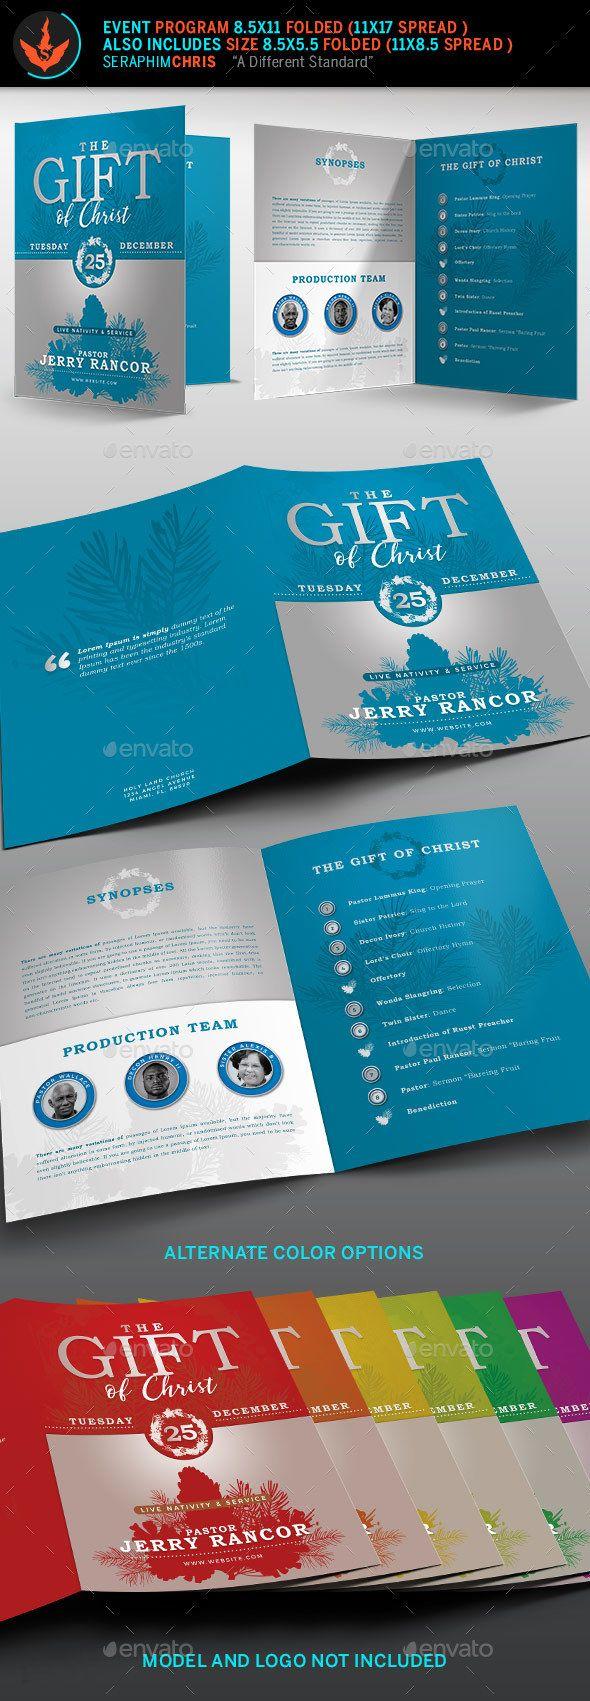 Besten Brochure Templates Bilder Auf Pinterest - Informational brochure template